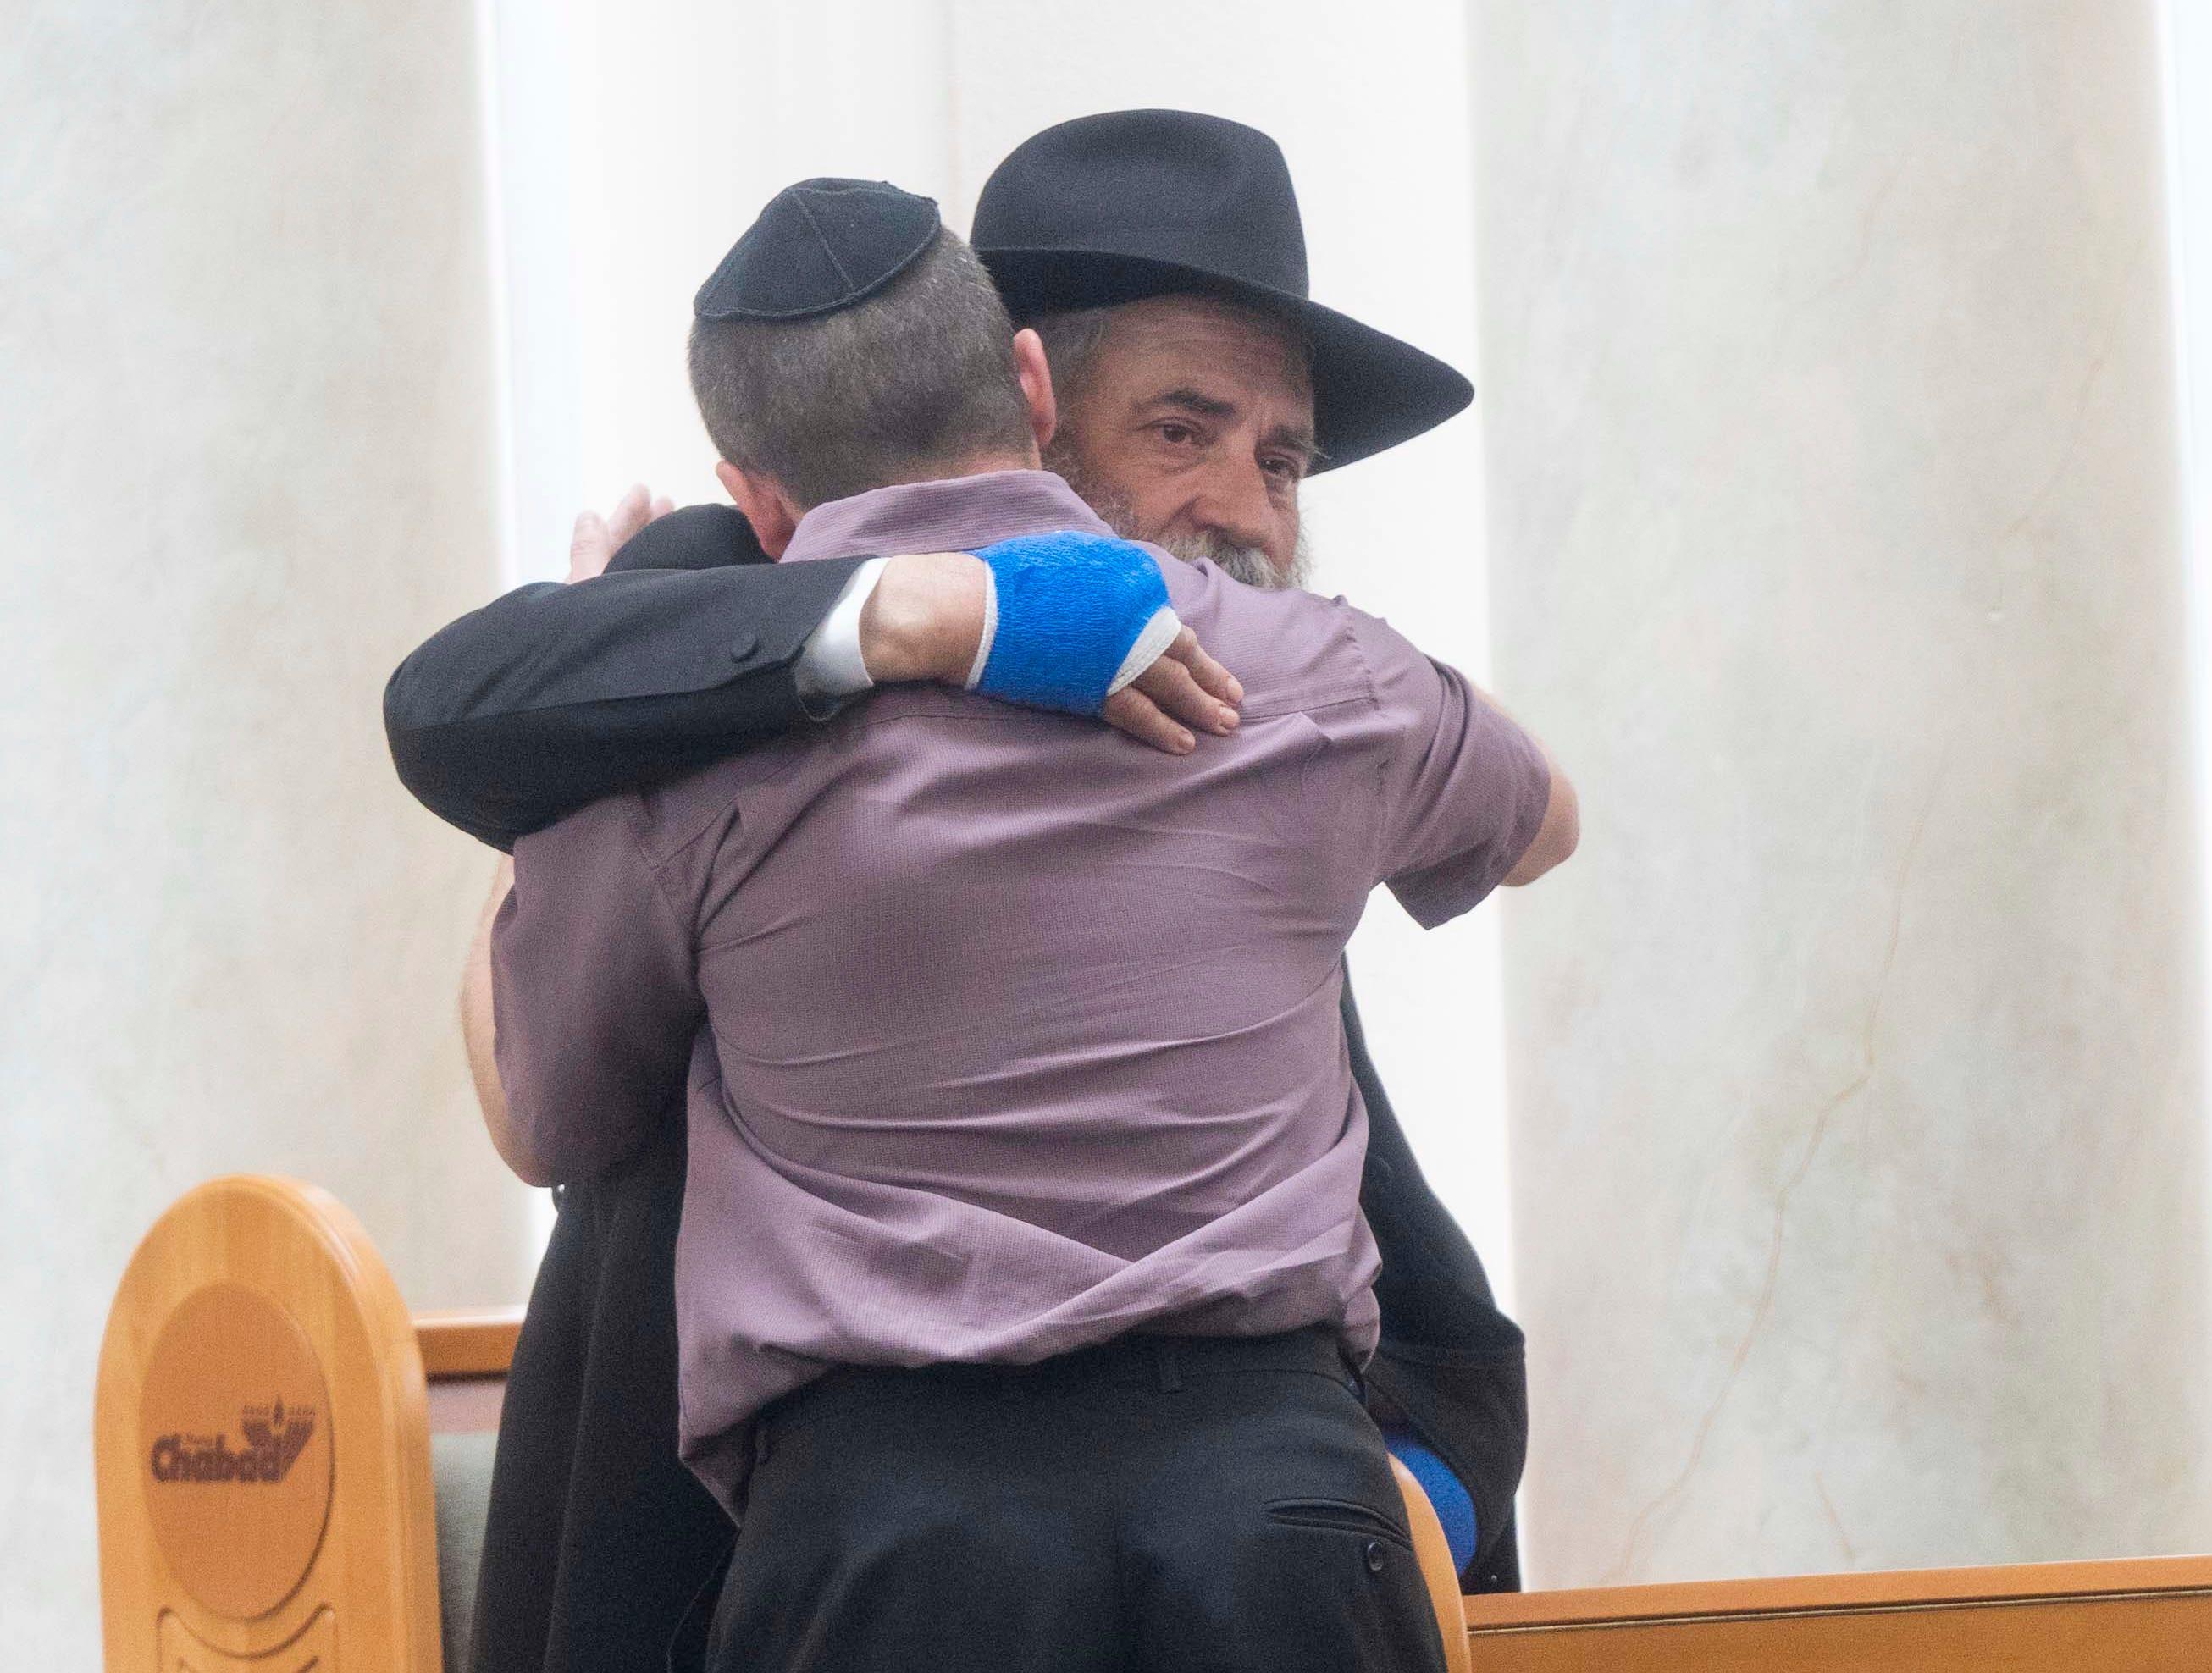 Rabbi Yisroel Goldstein of Chabad of Poway Synagogue gives hugs to family and friends during Lori Gilbert-Kaye's funeral.